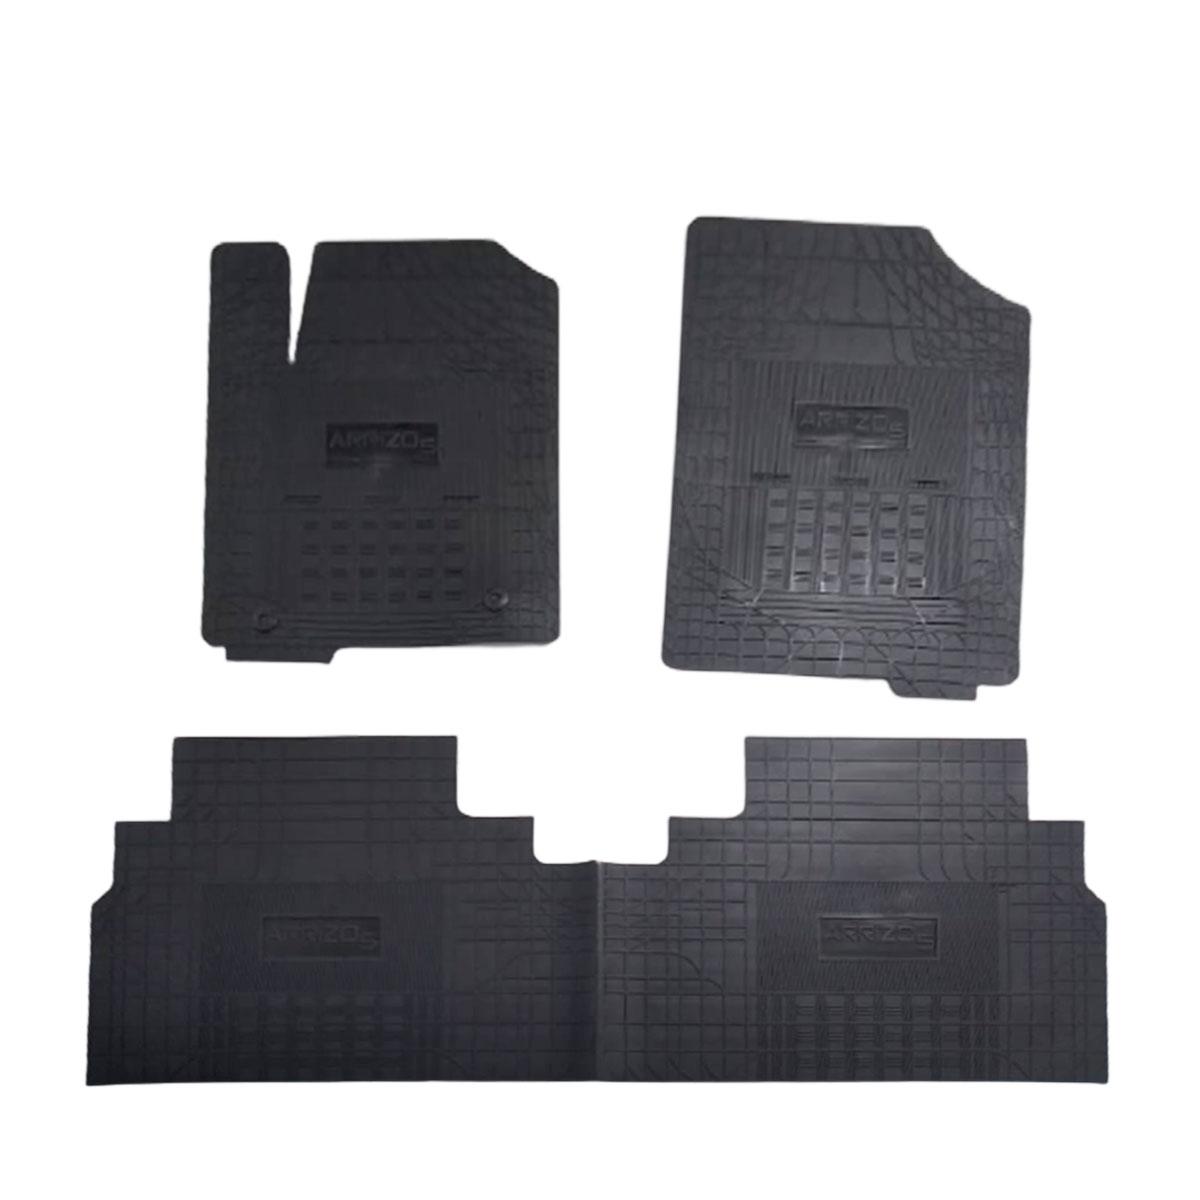 Tapete de Borracha PVC Reforçado Chery Arrizo5 Tapeplass